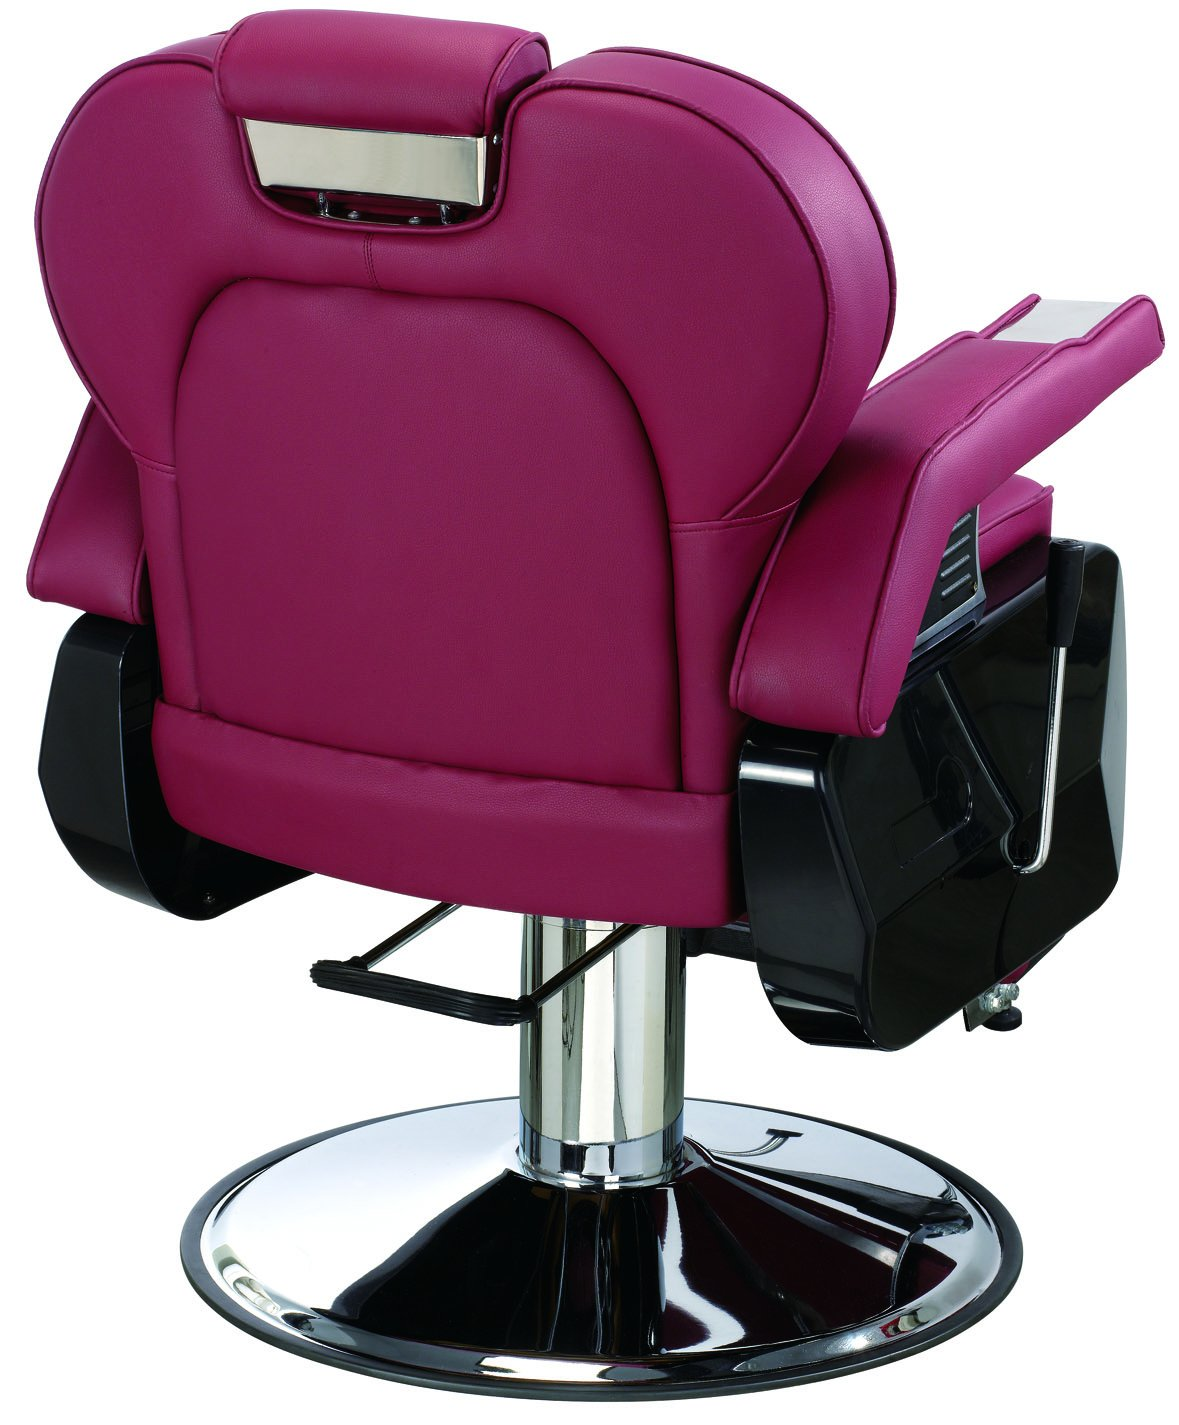 Amazoncom All Purpose Hydraulic Recline Barber Chair Salon Spa J